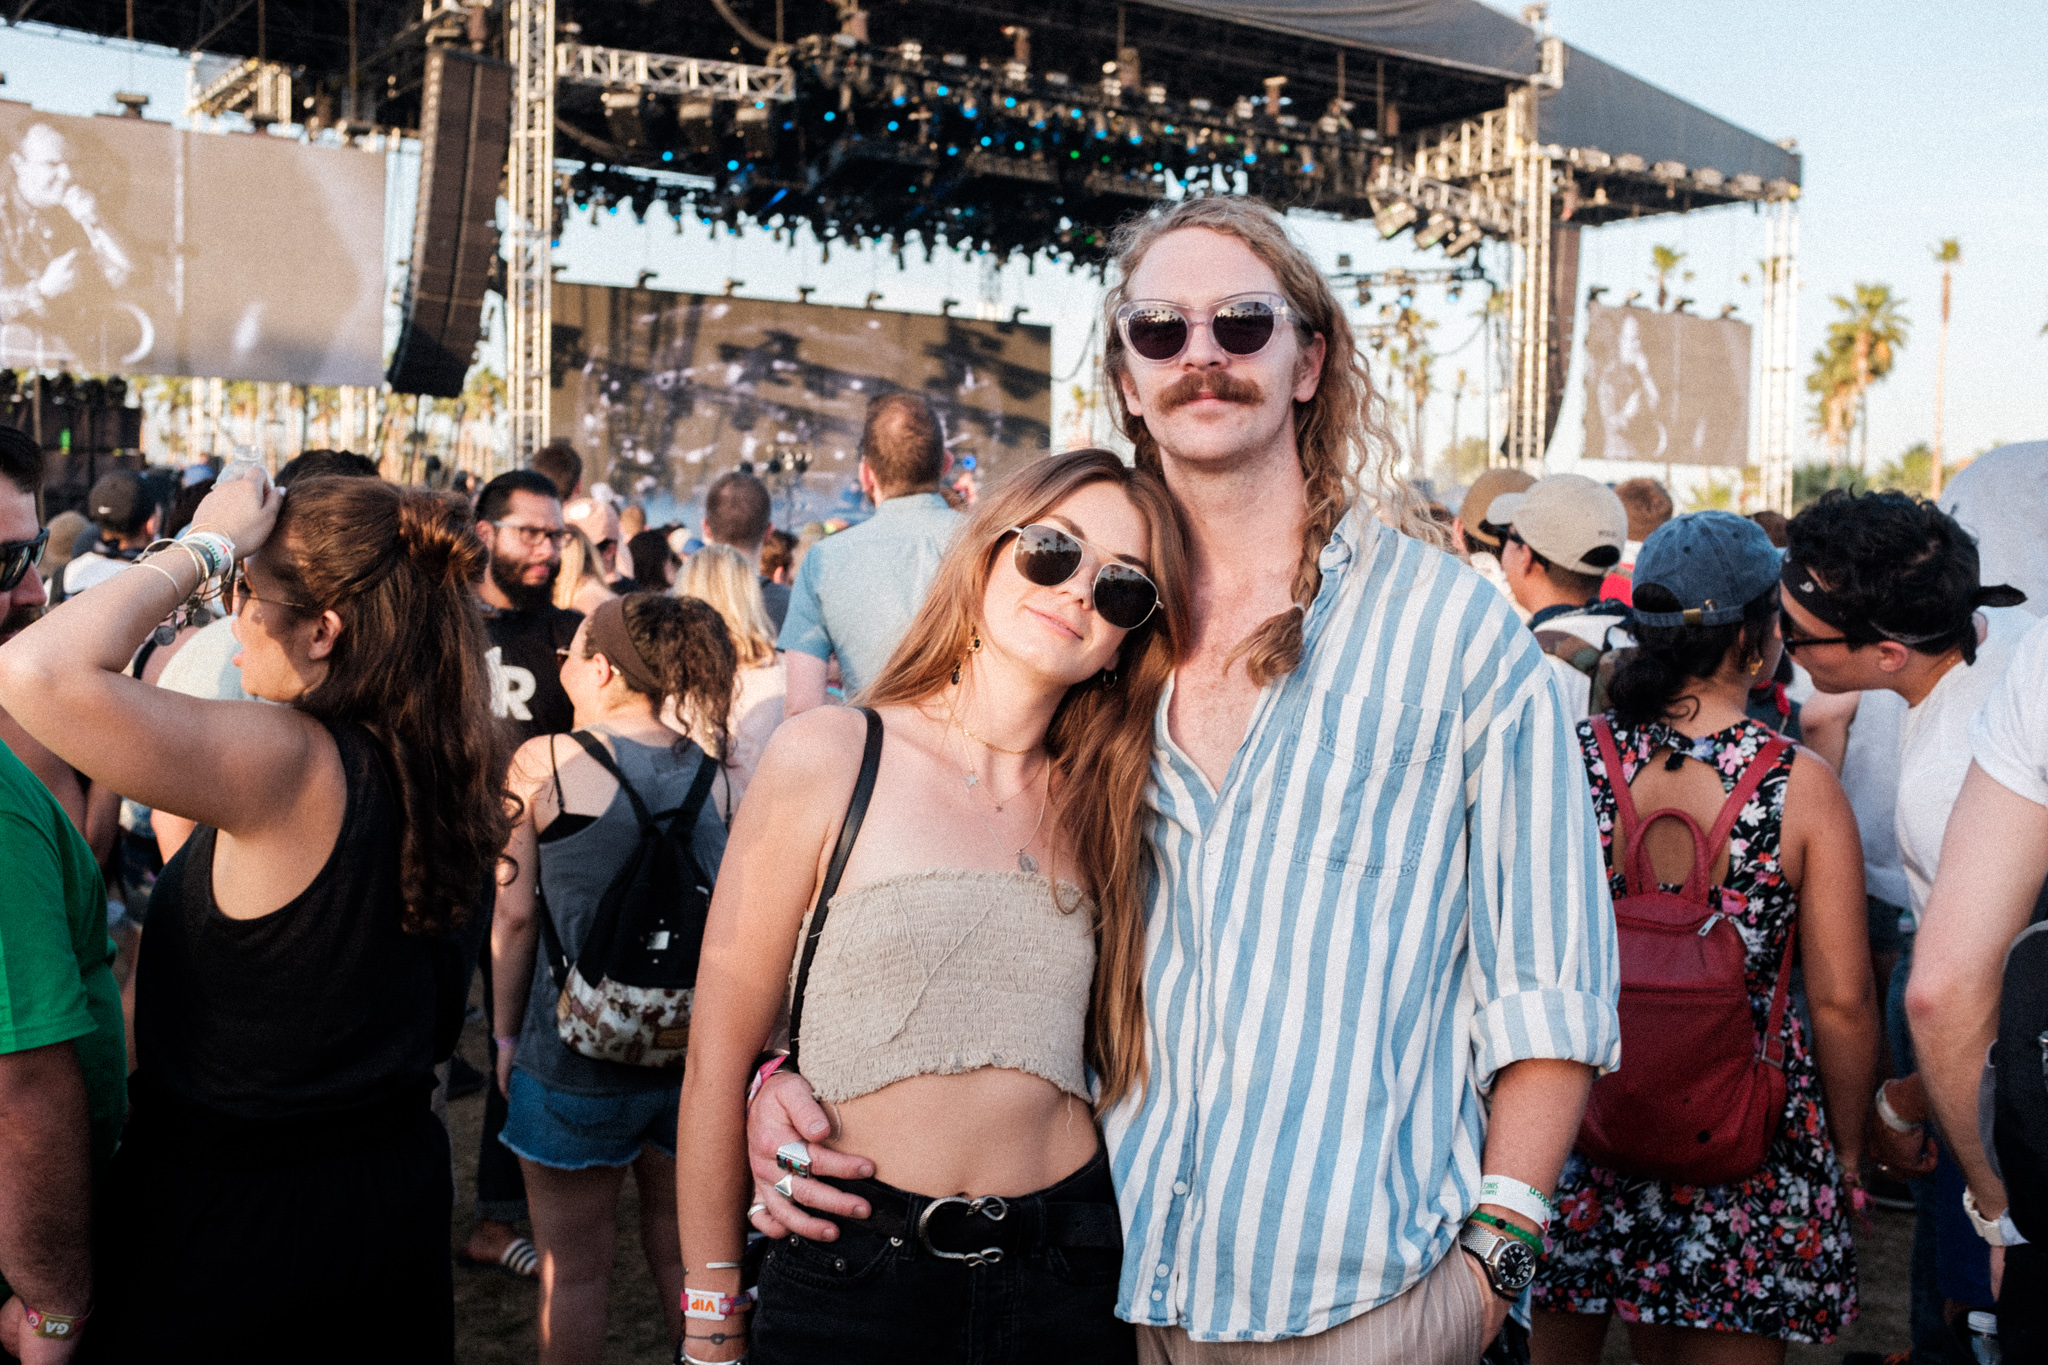 170423 Coachella 17 w2 2024.jpg